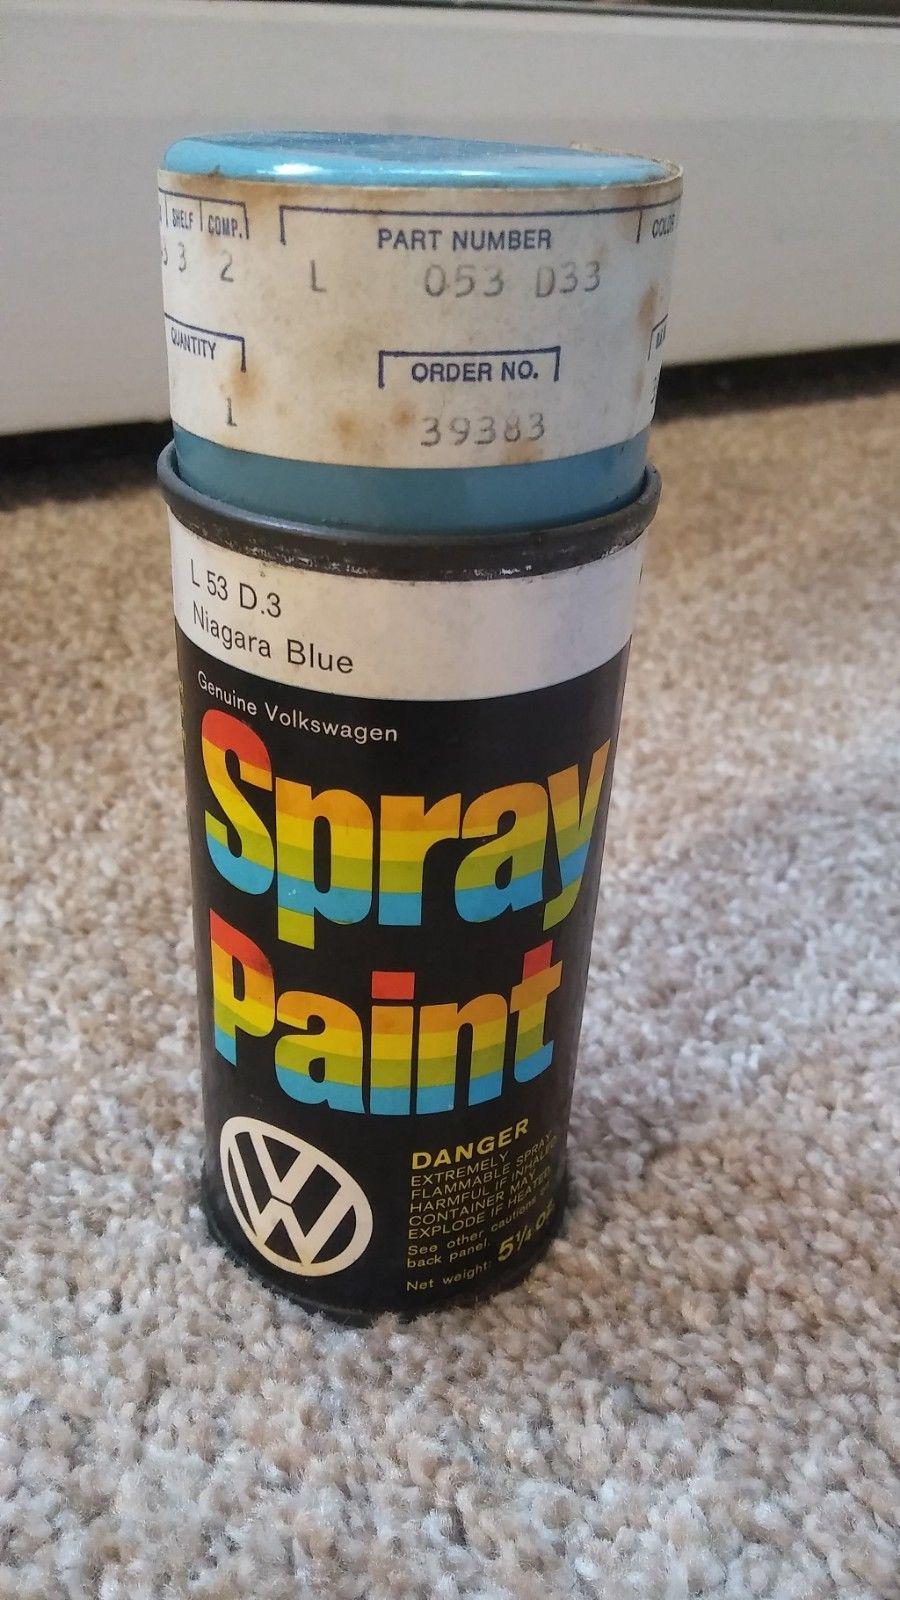 TheSamba com :: Gallery - VW Spray Paint Can Niagara Blue L5D3